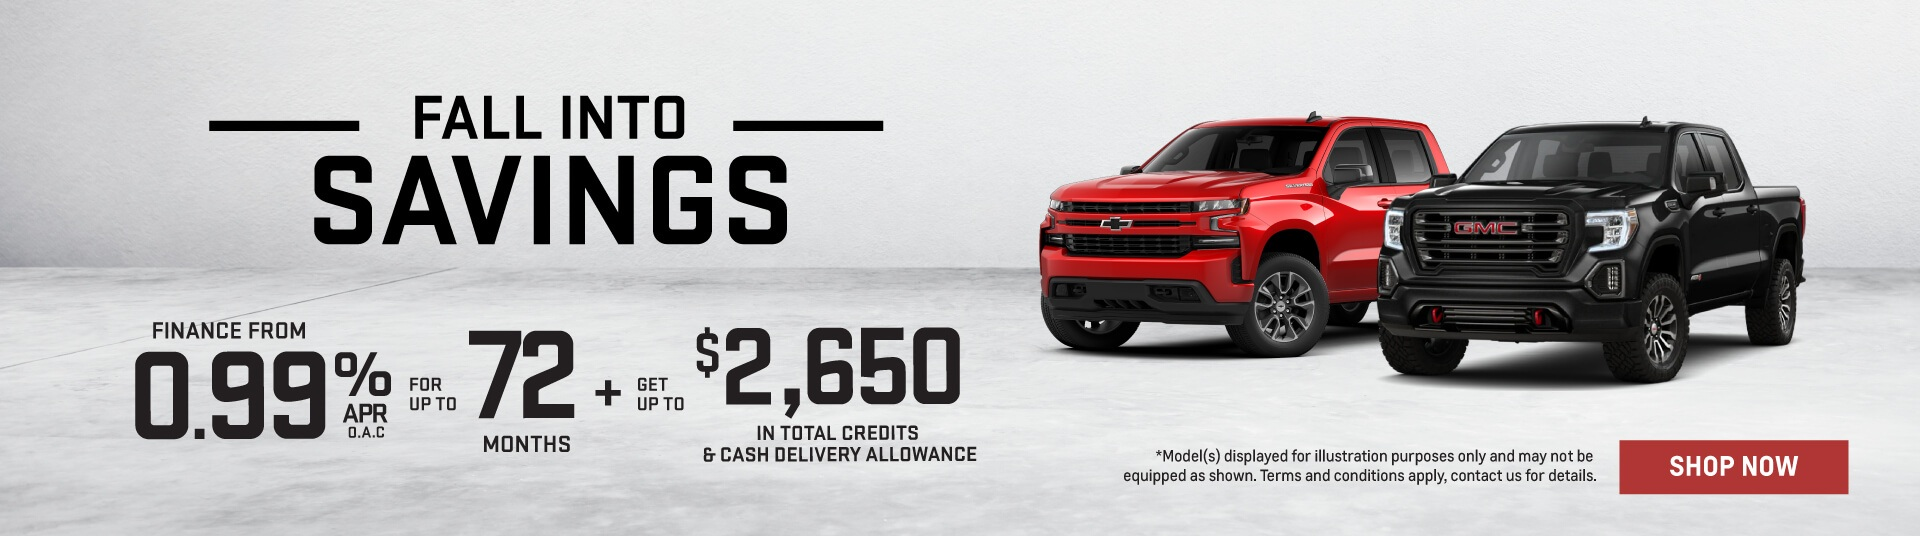 Fall Into Savings GM Trucks - Humberview GM